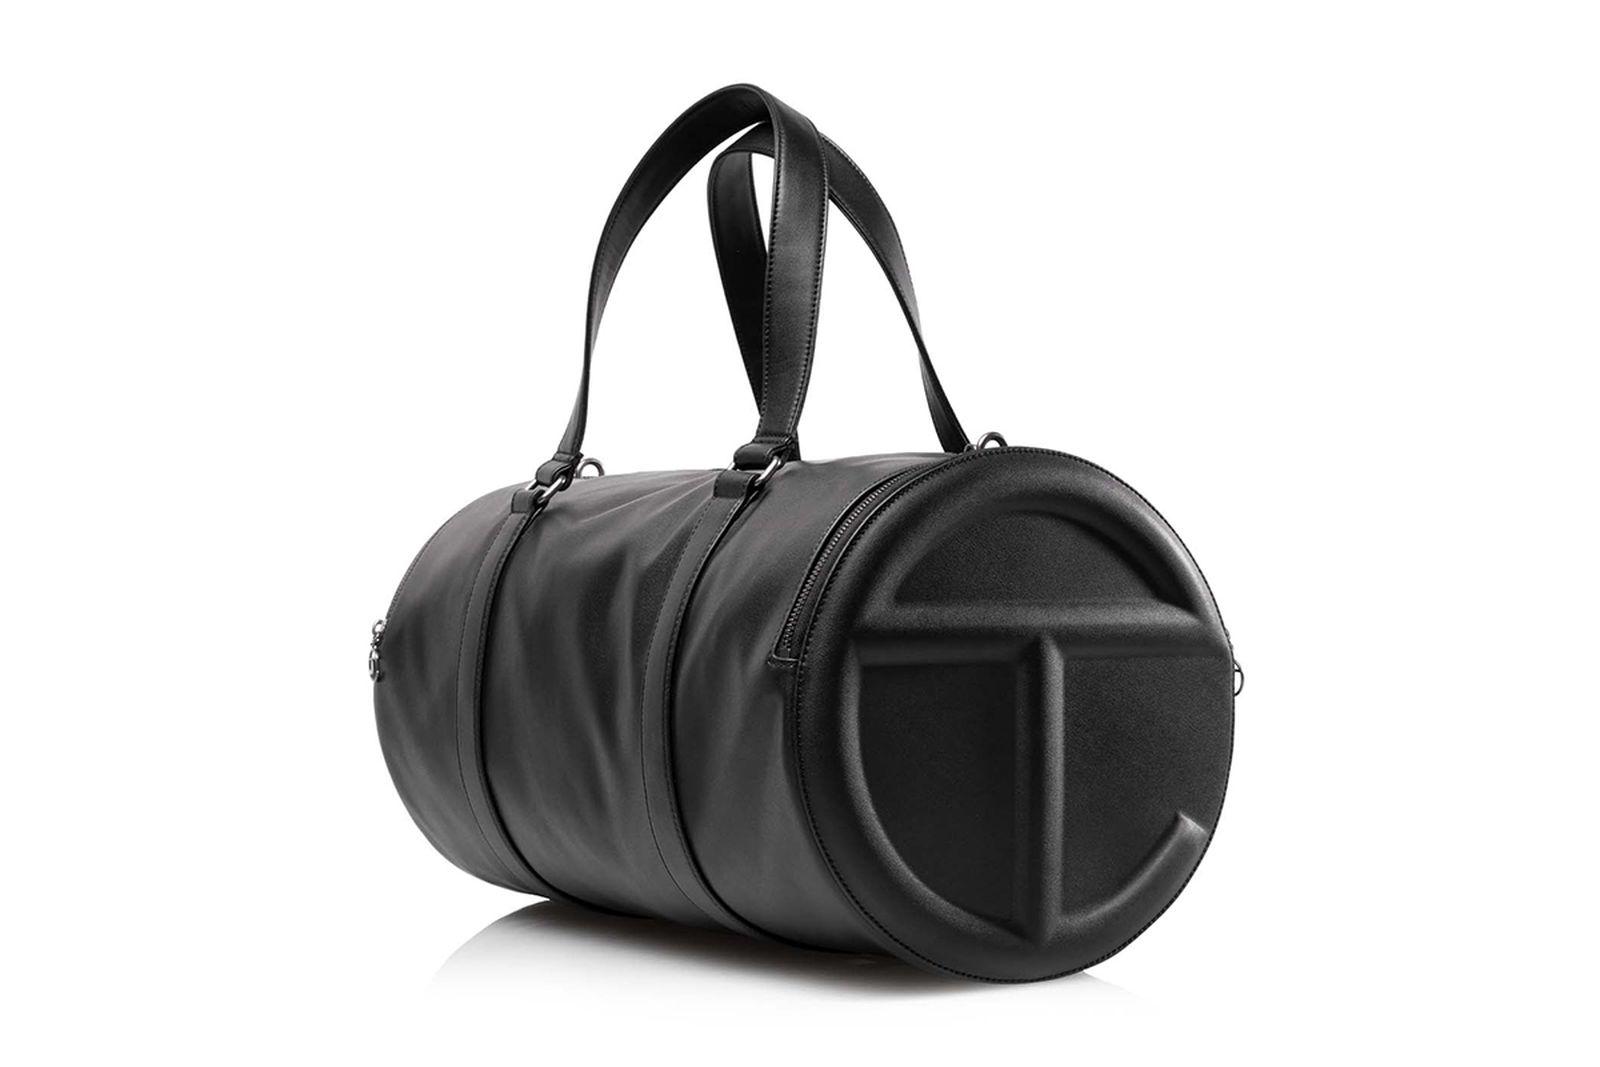 telfar duffle bag black release date buy info price